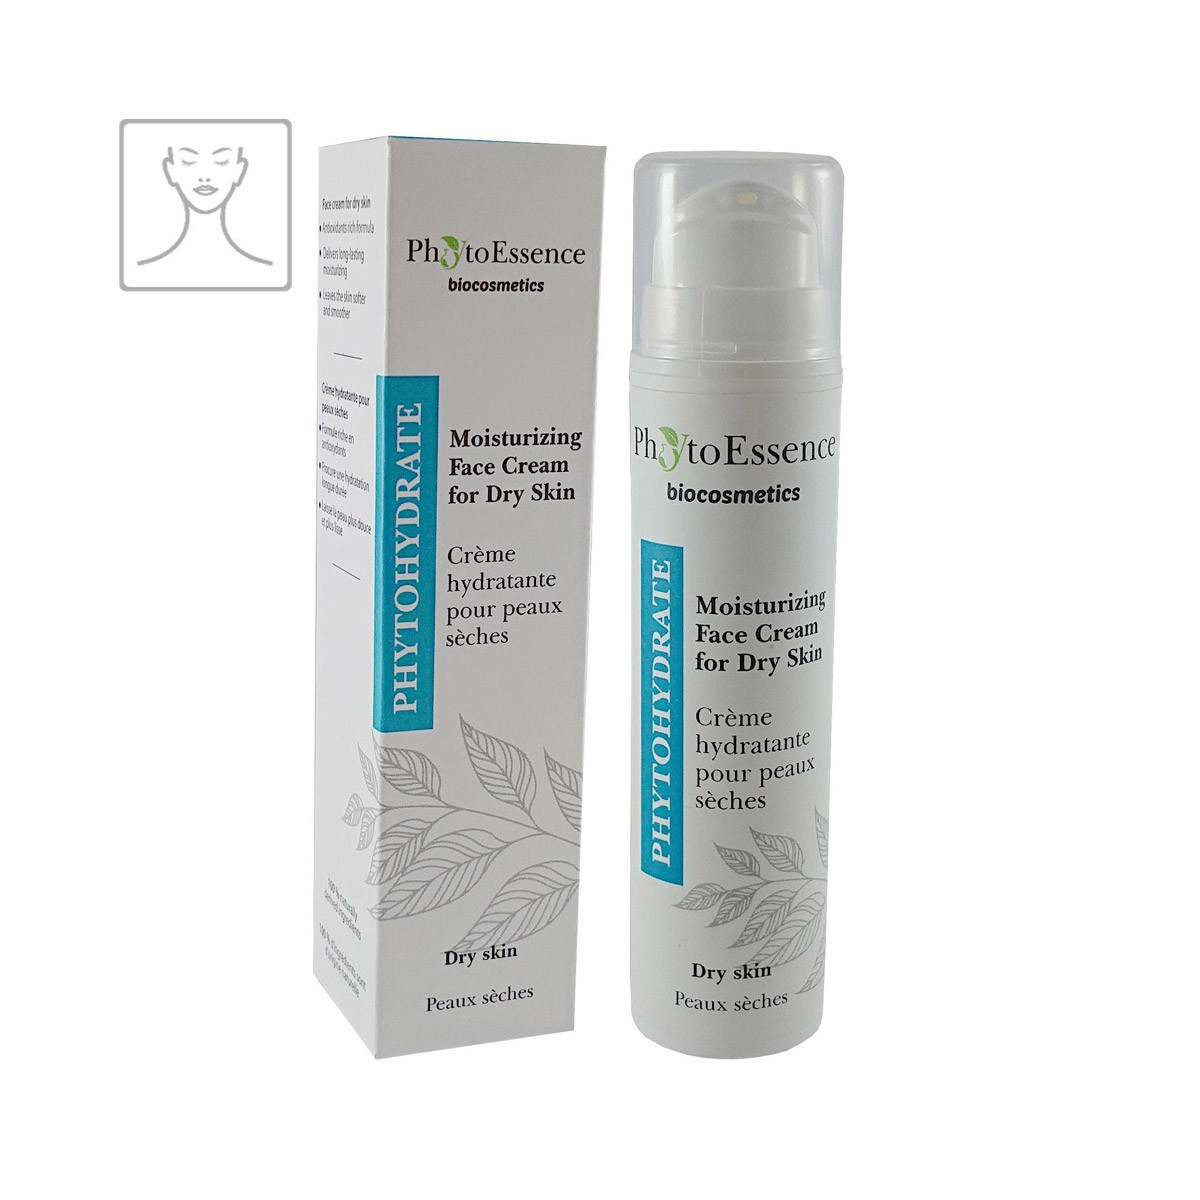 Moisturizing Face Cream for Dry Skin PhytoEssence hydratační pleťový krém na suchou pleť s aloe vera